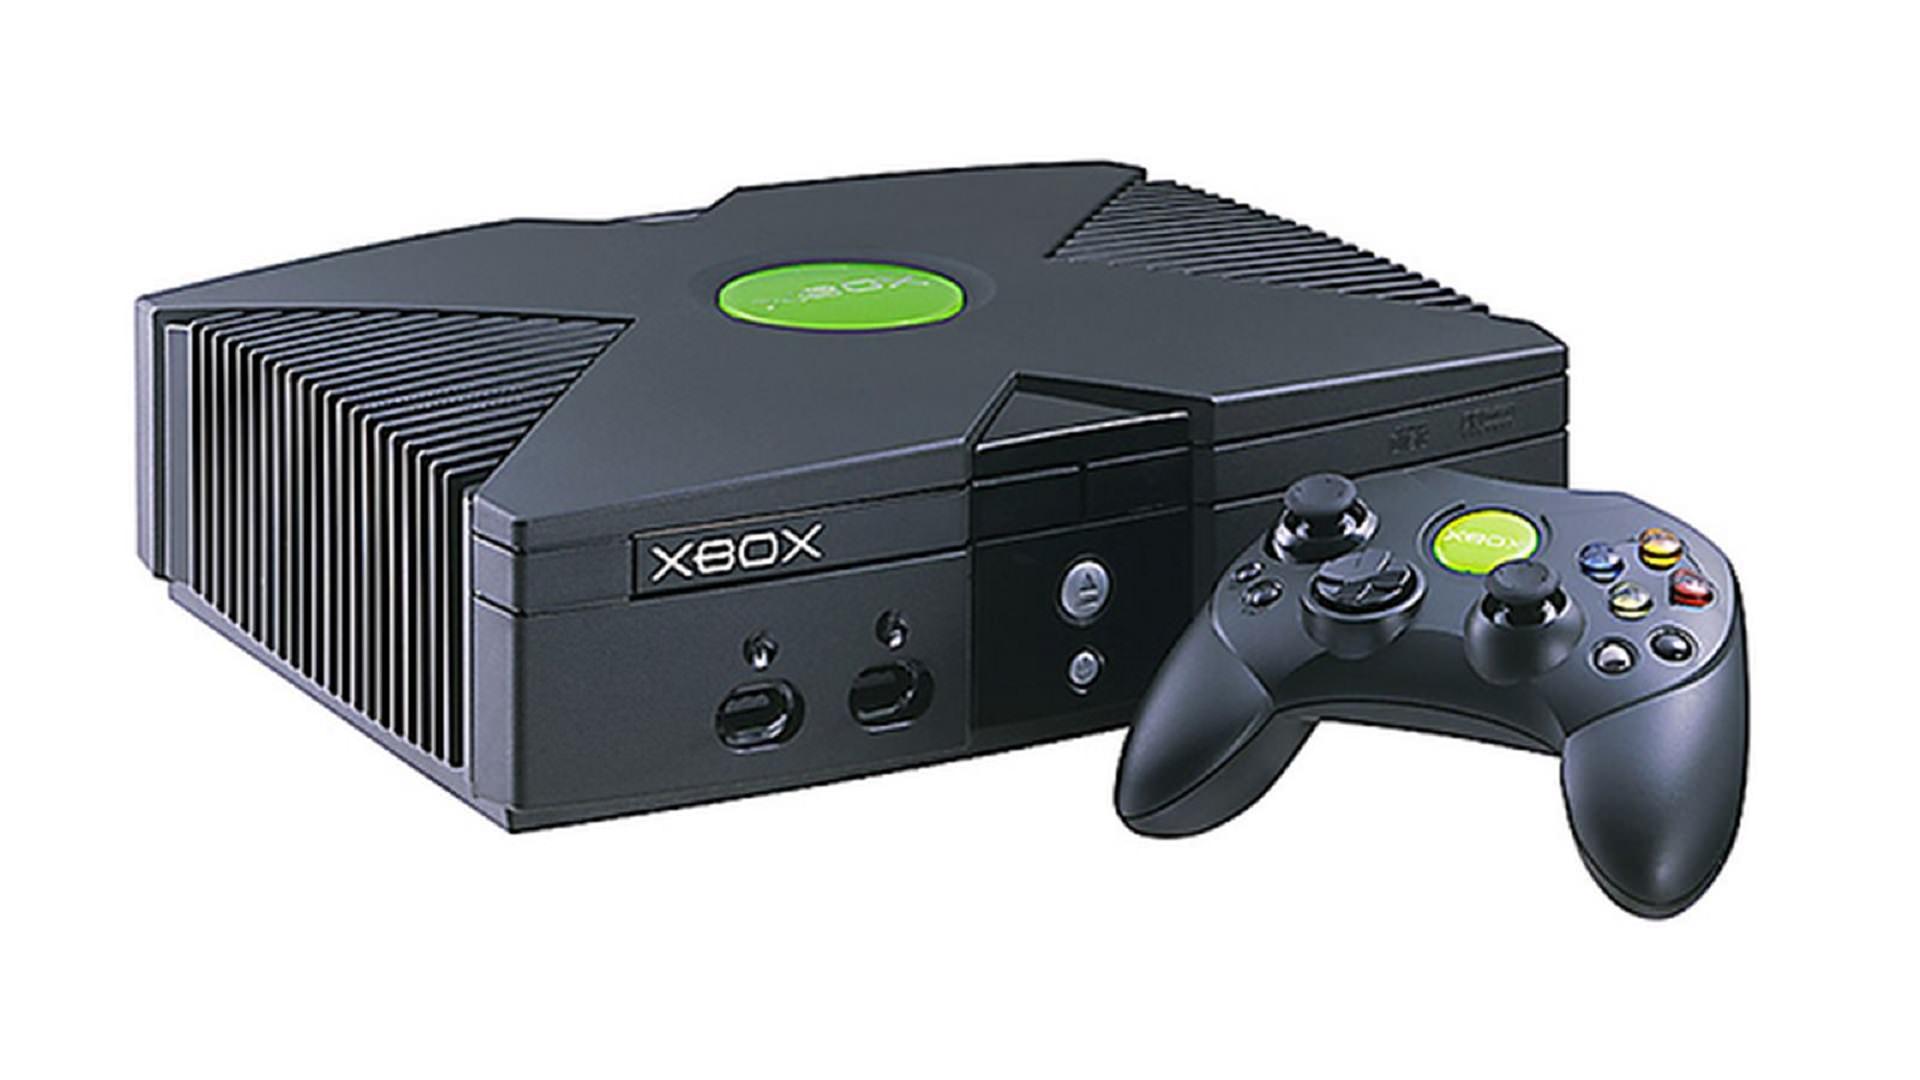 Original Xbox Game Ship : Original xbox games that should be backwards compatible